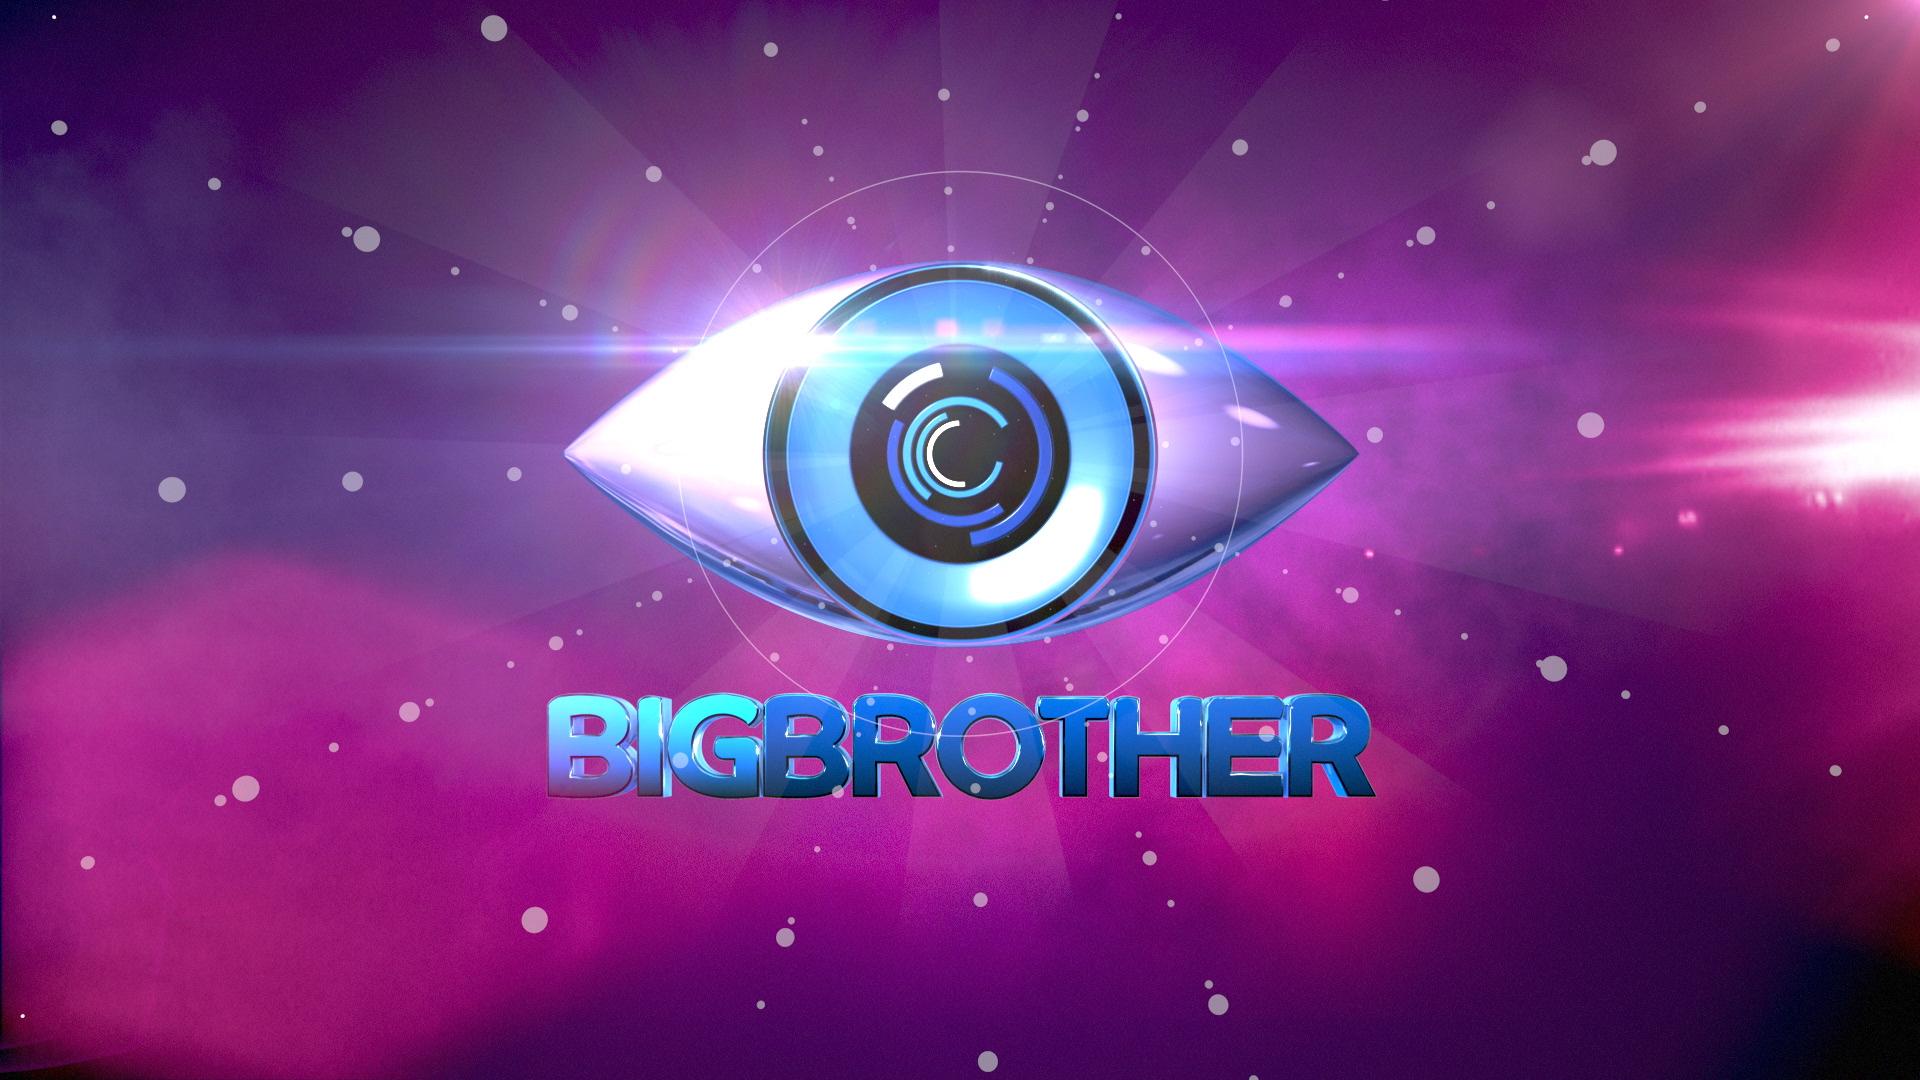 BIG_BROTHER_23.jpg